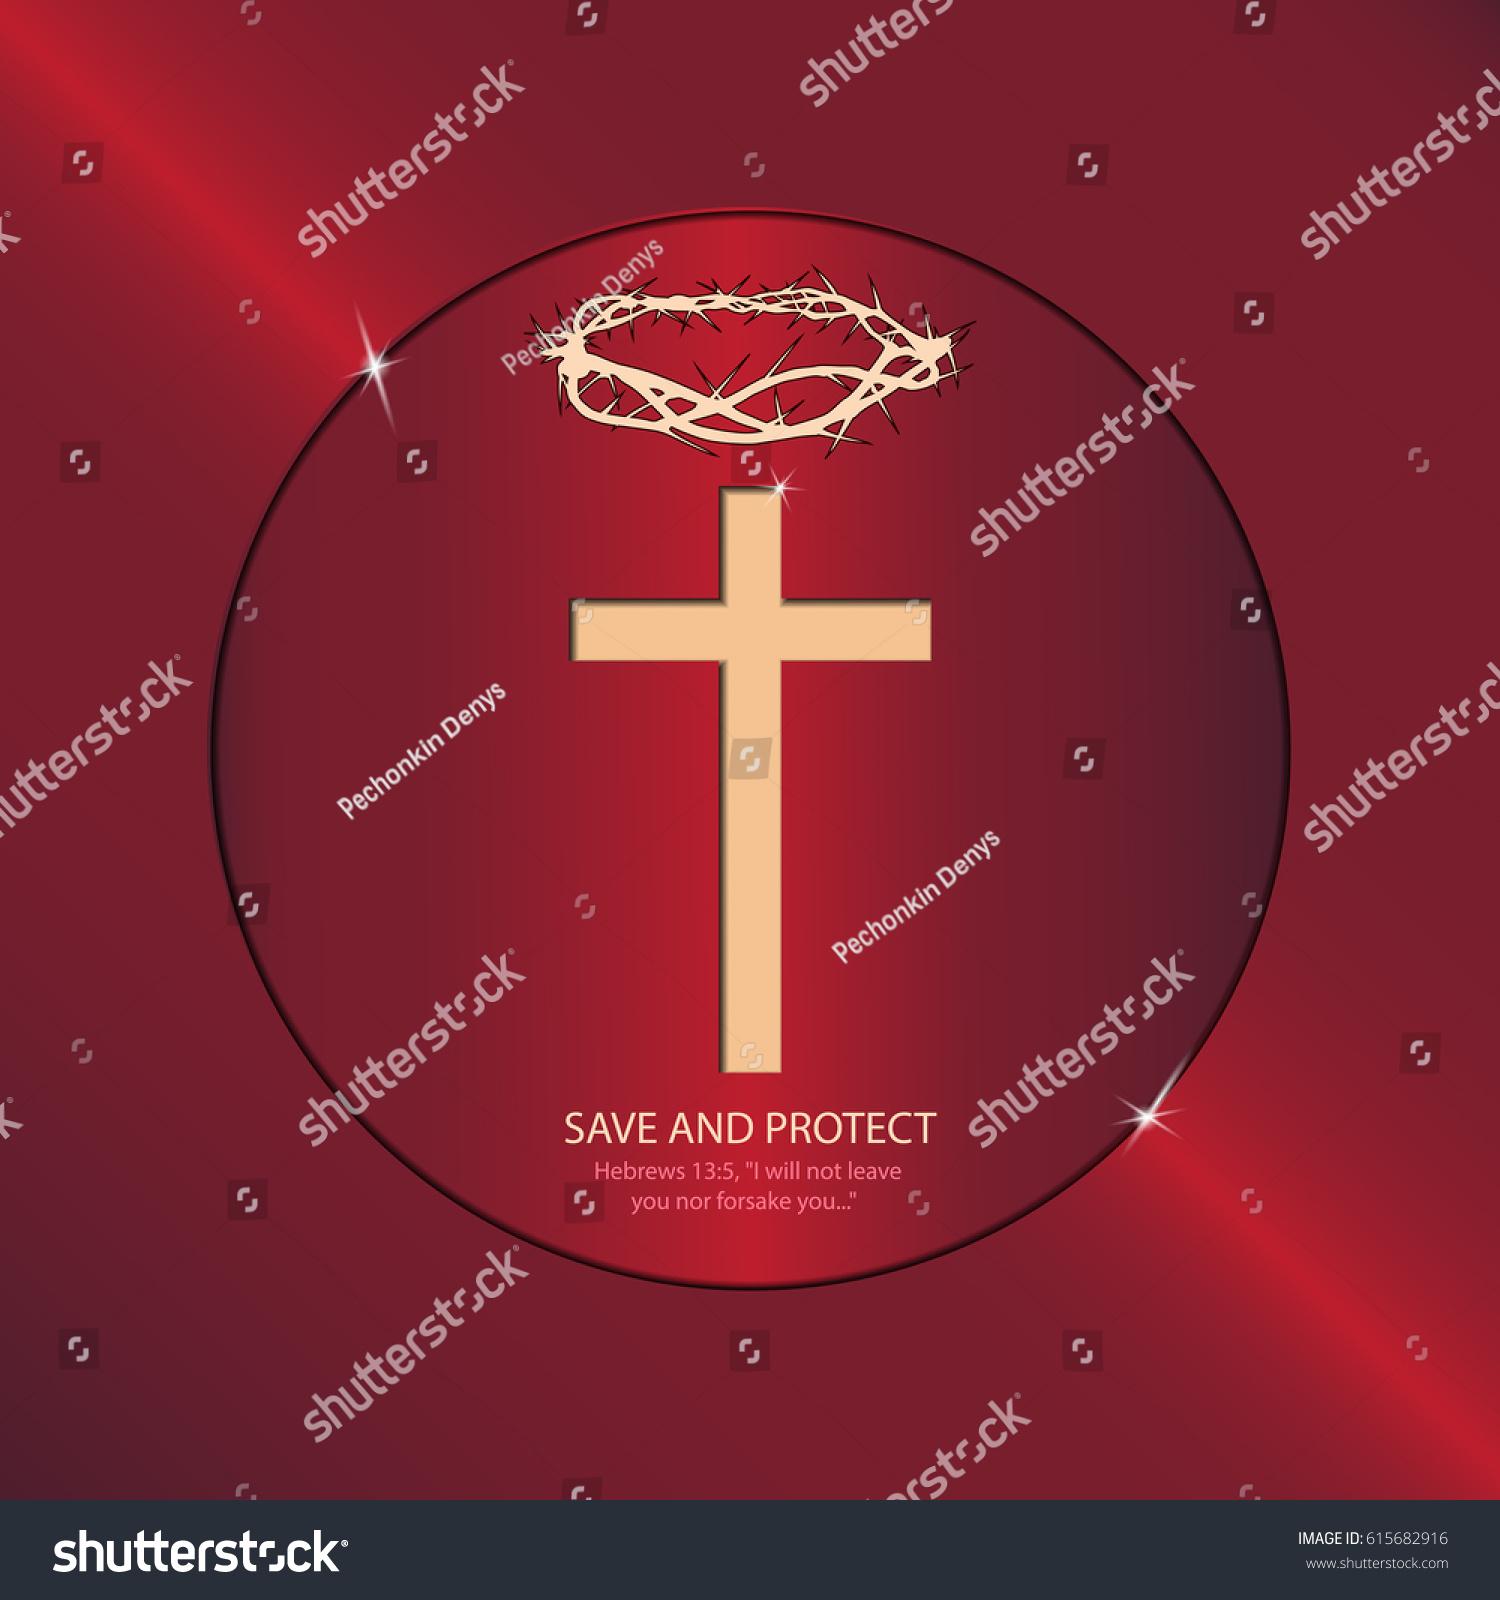 Religious Symbols Speak Us About Sacrifice Stock Illustration